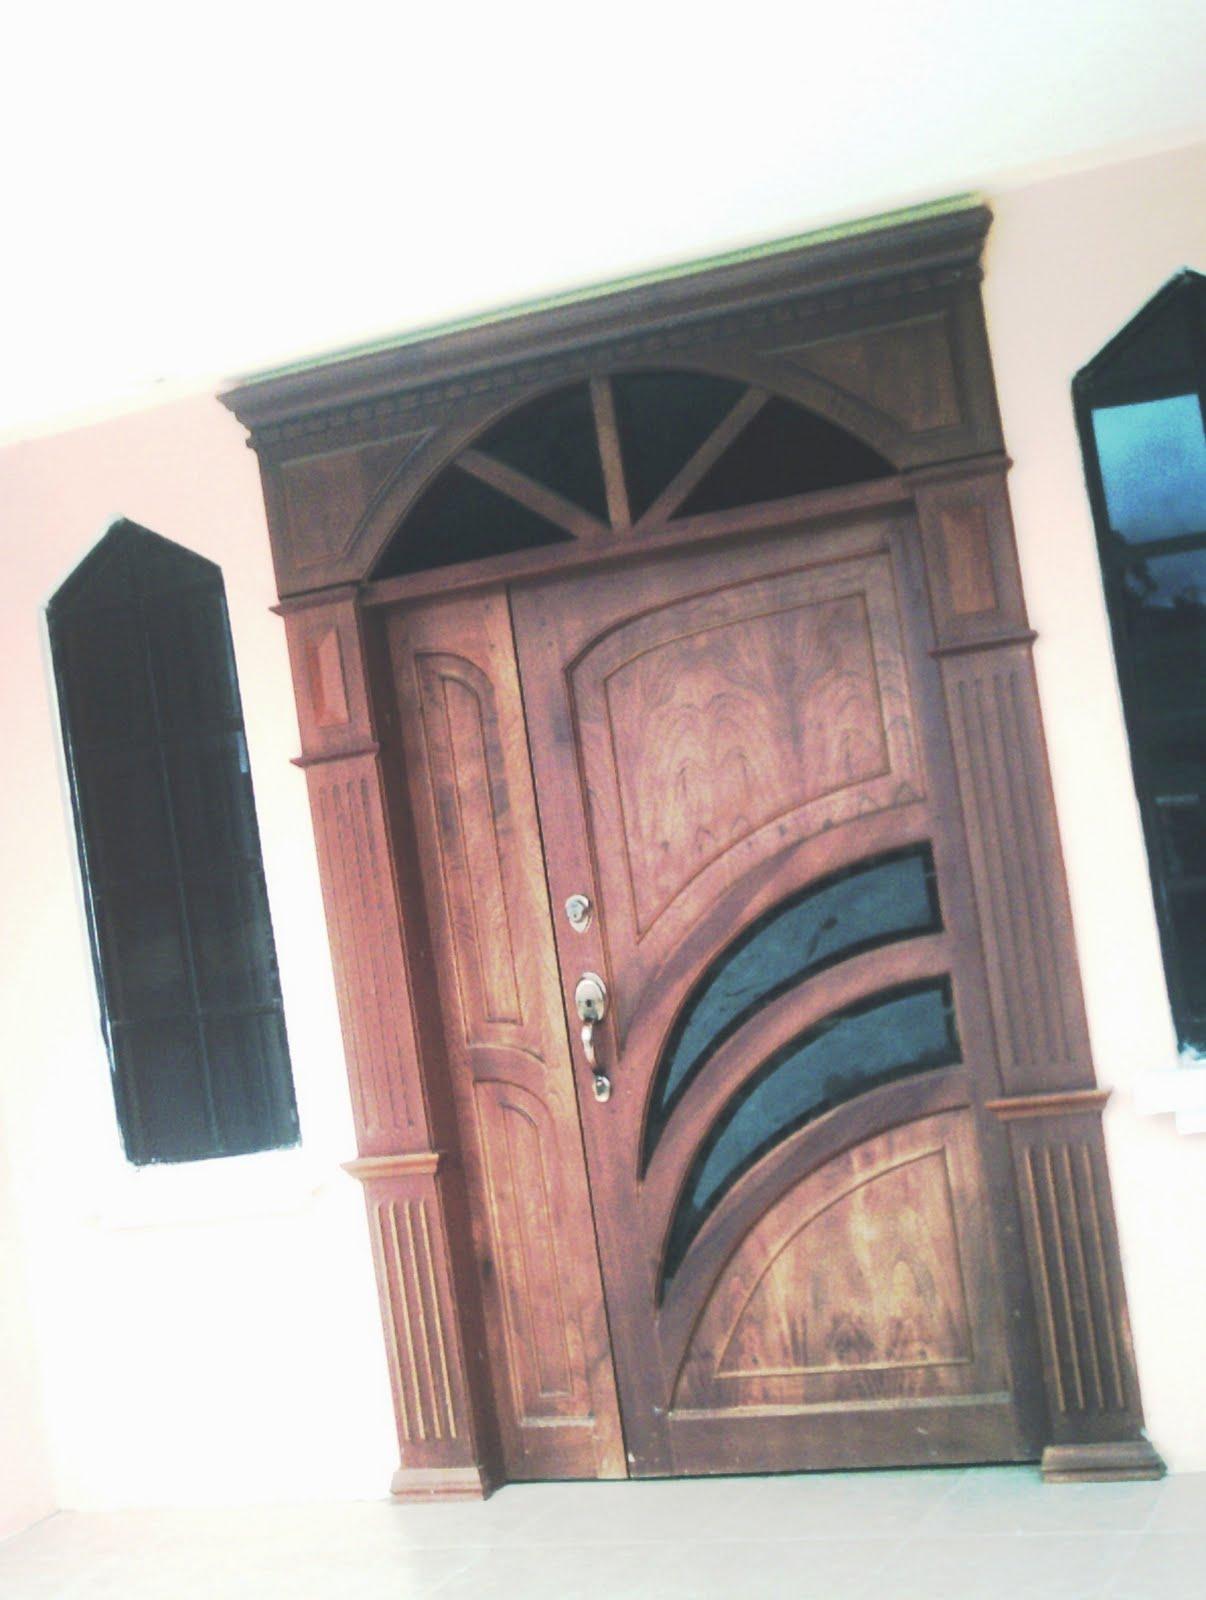 Ideatumobiliario puertas interiores y exteriores para su for Madera para puertas exteriores